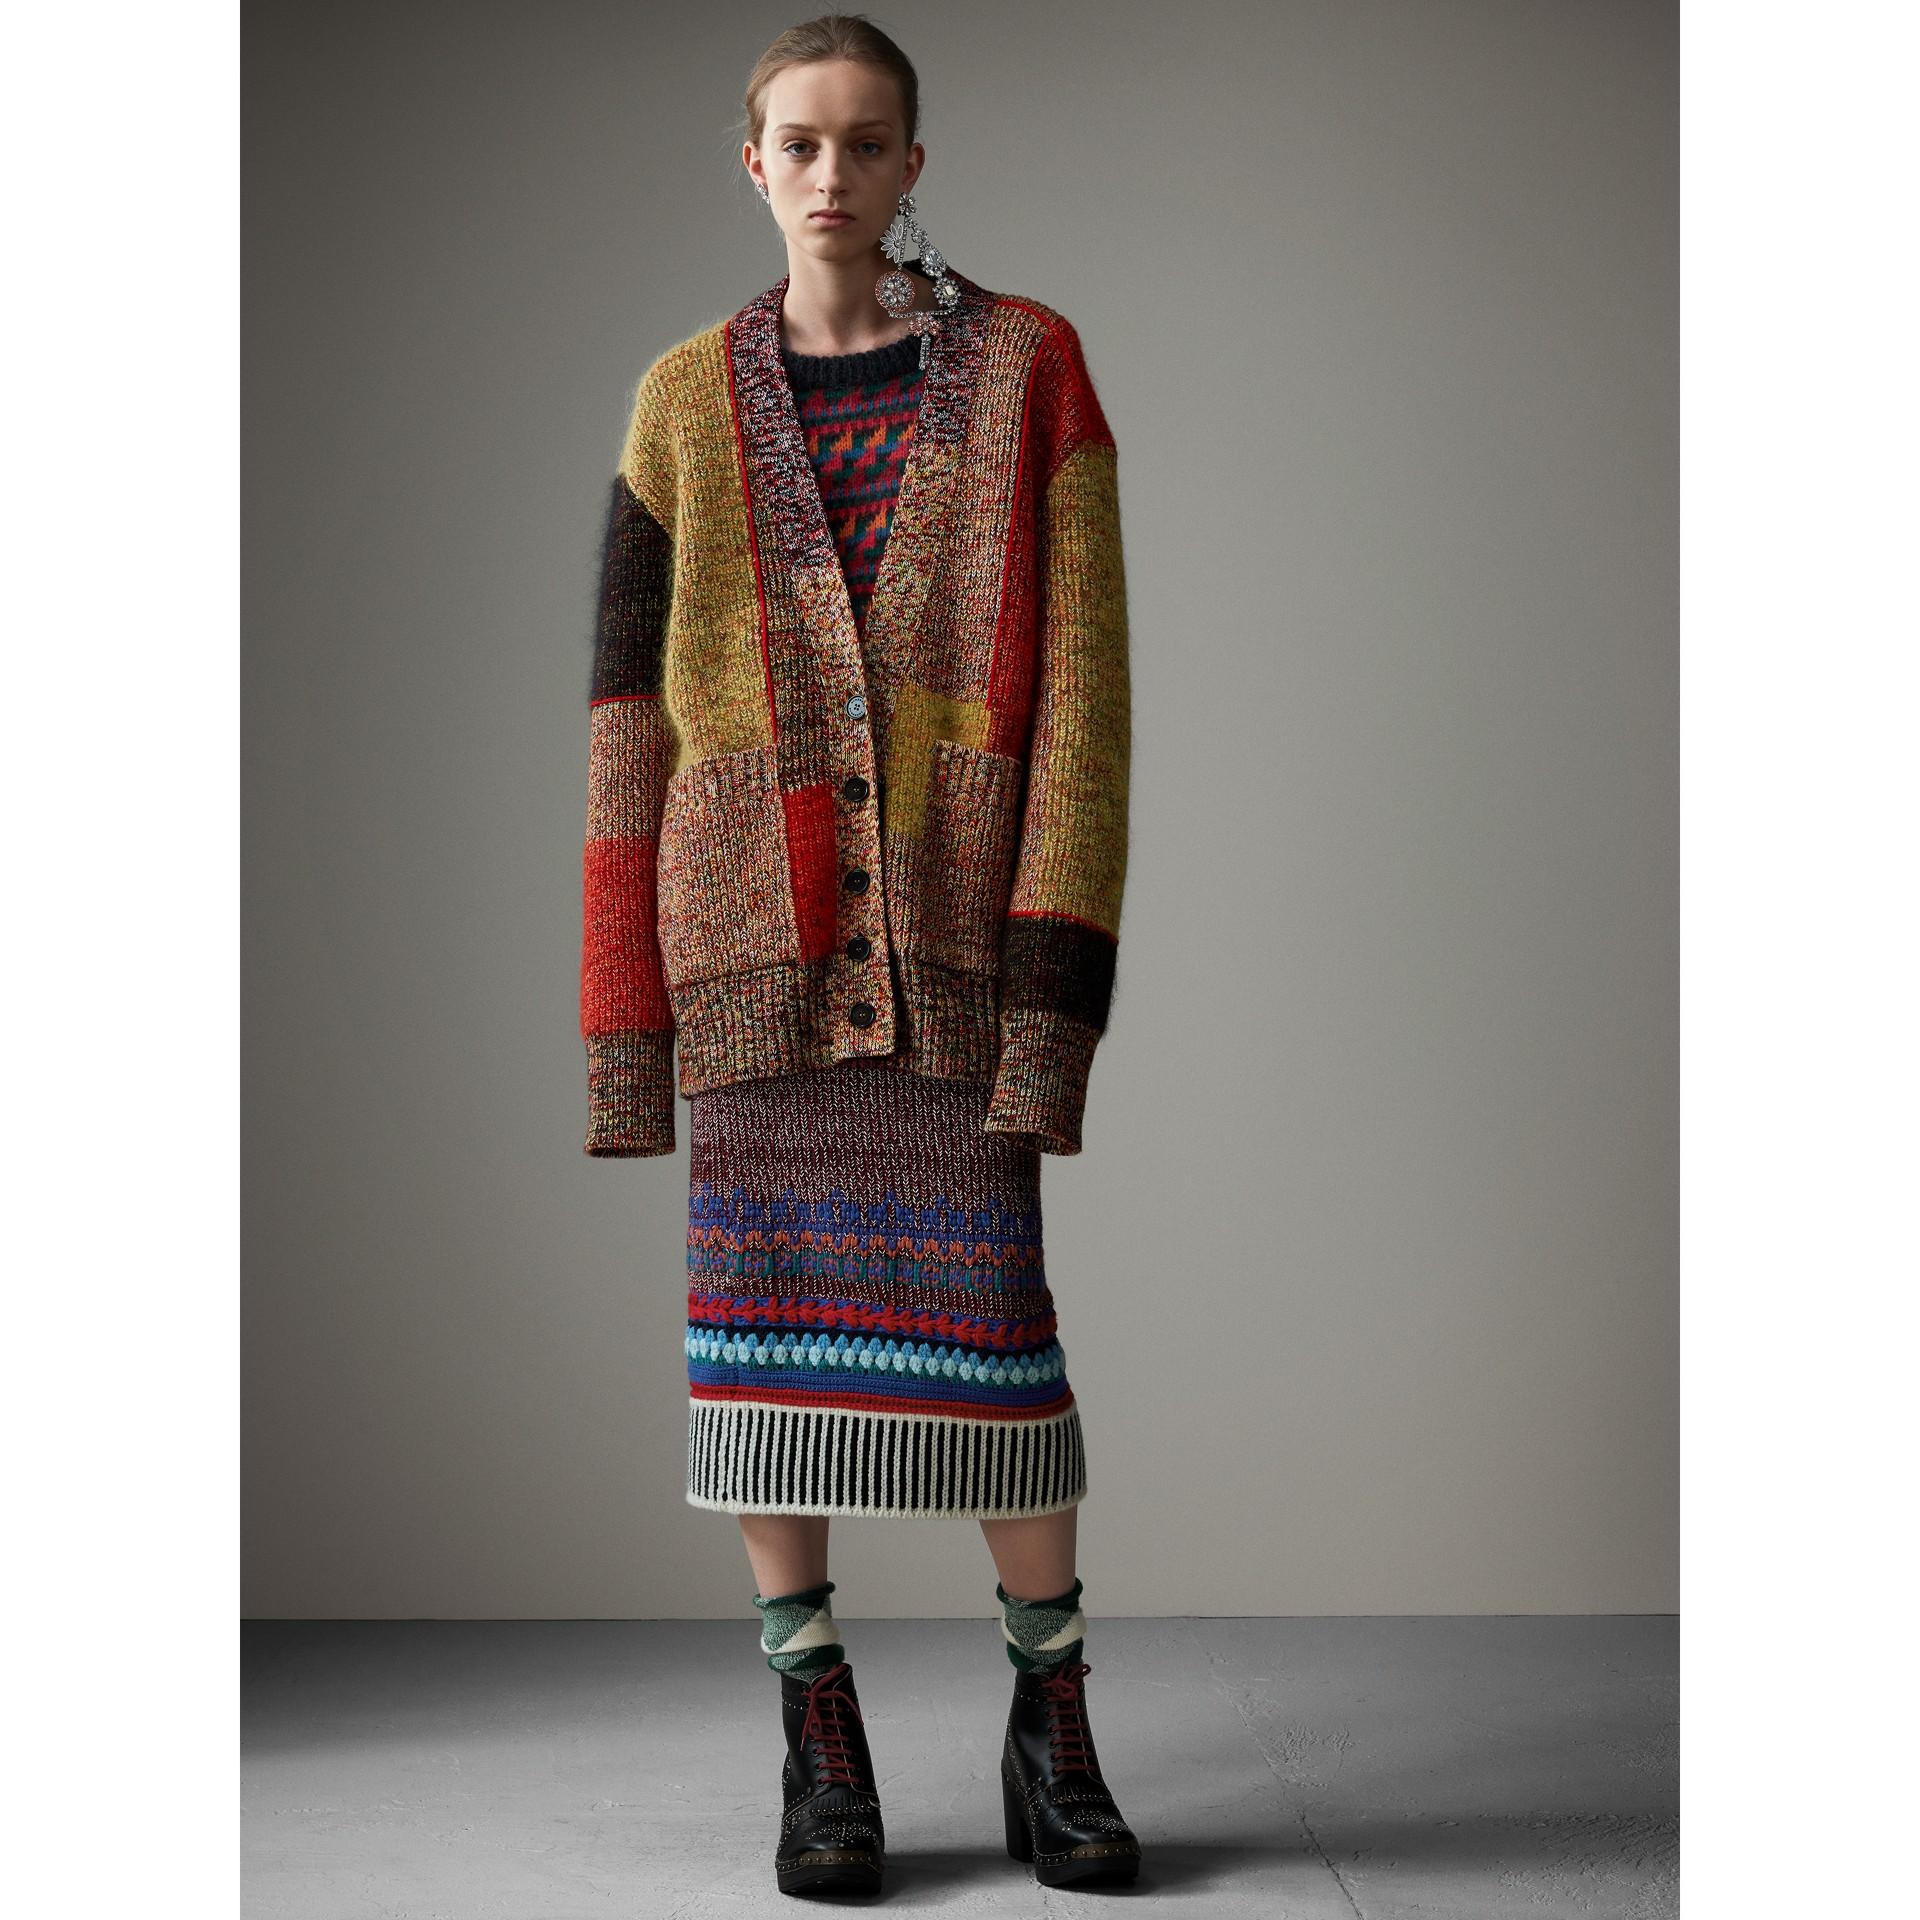 Wool Linen Mohair Blend Mouliné Oversized Cardigan in Multicolour - Women | Burberry Hong Kong - gallery image 7